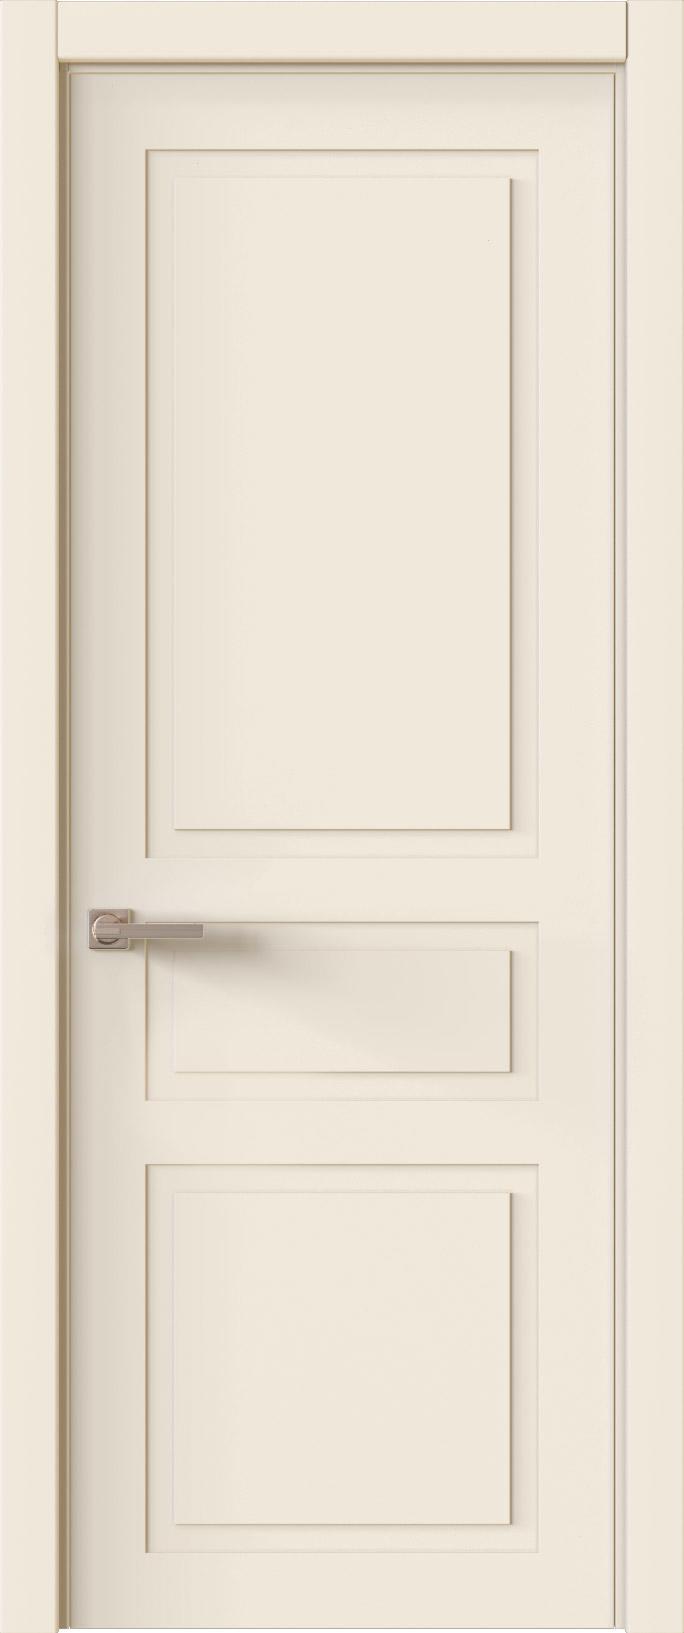 Tivoli Е-5 цвет - Бежевая эмаль (RAL 9010) Без стекла (ДГ)